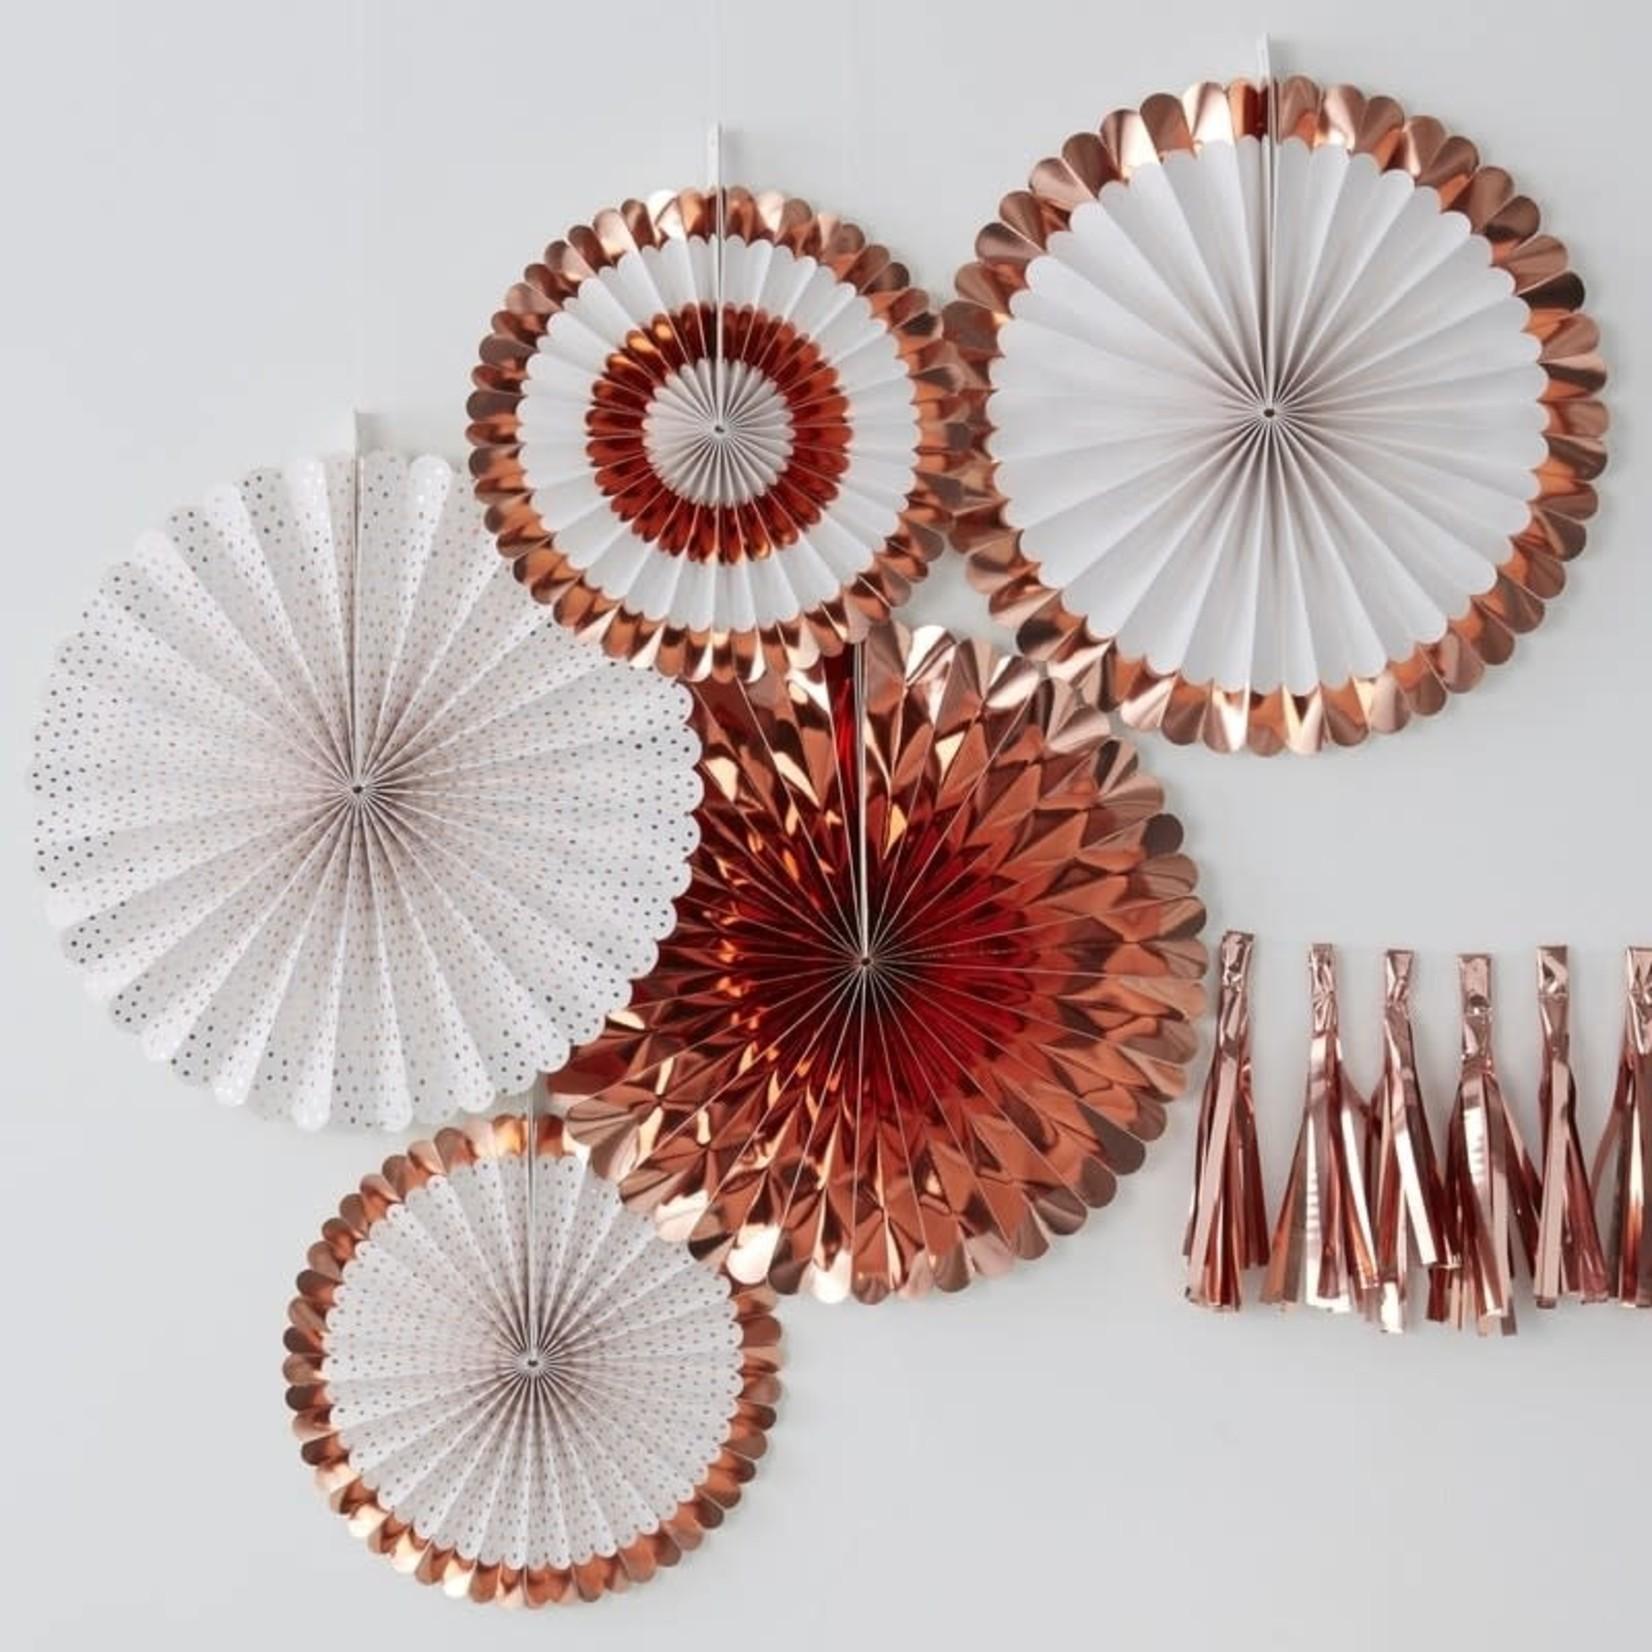 Fan Decorations - Rose Gold